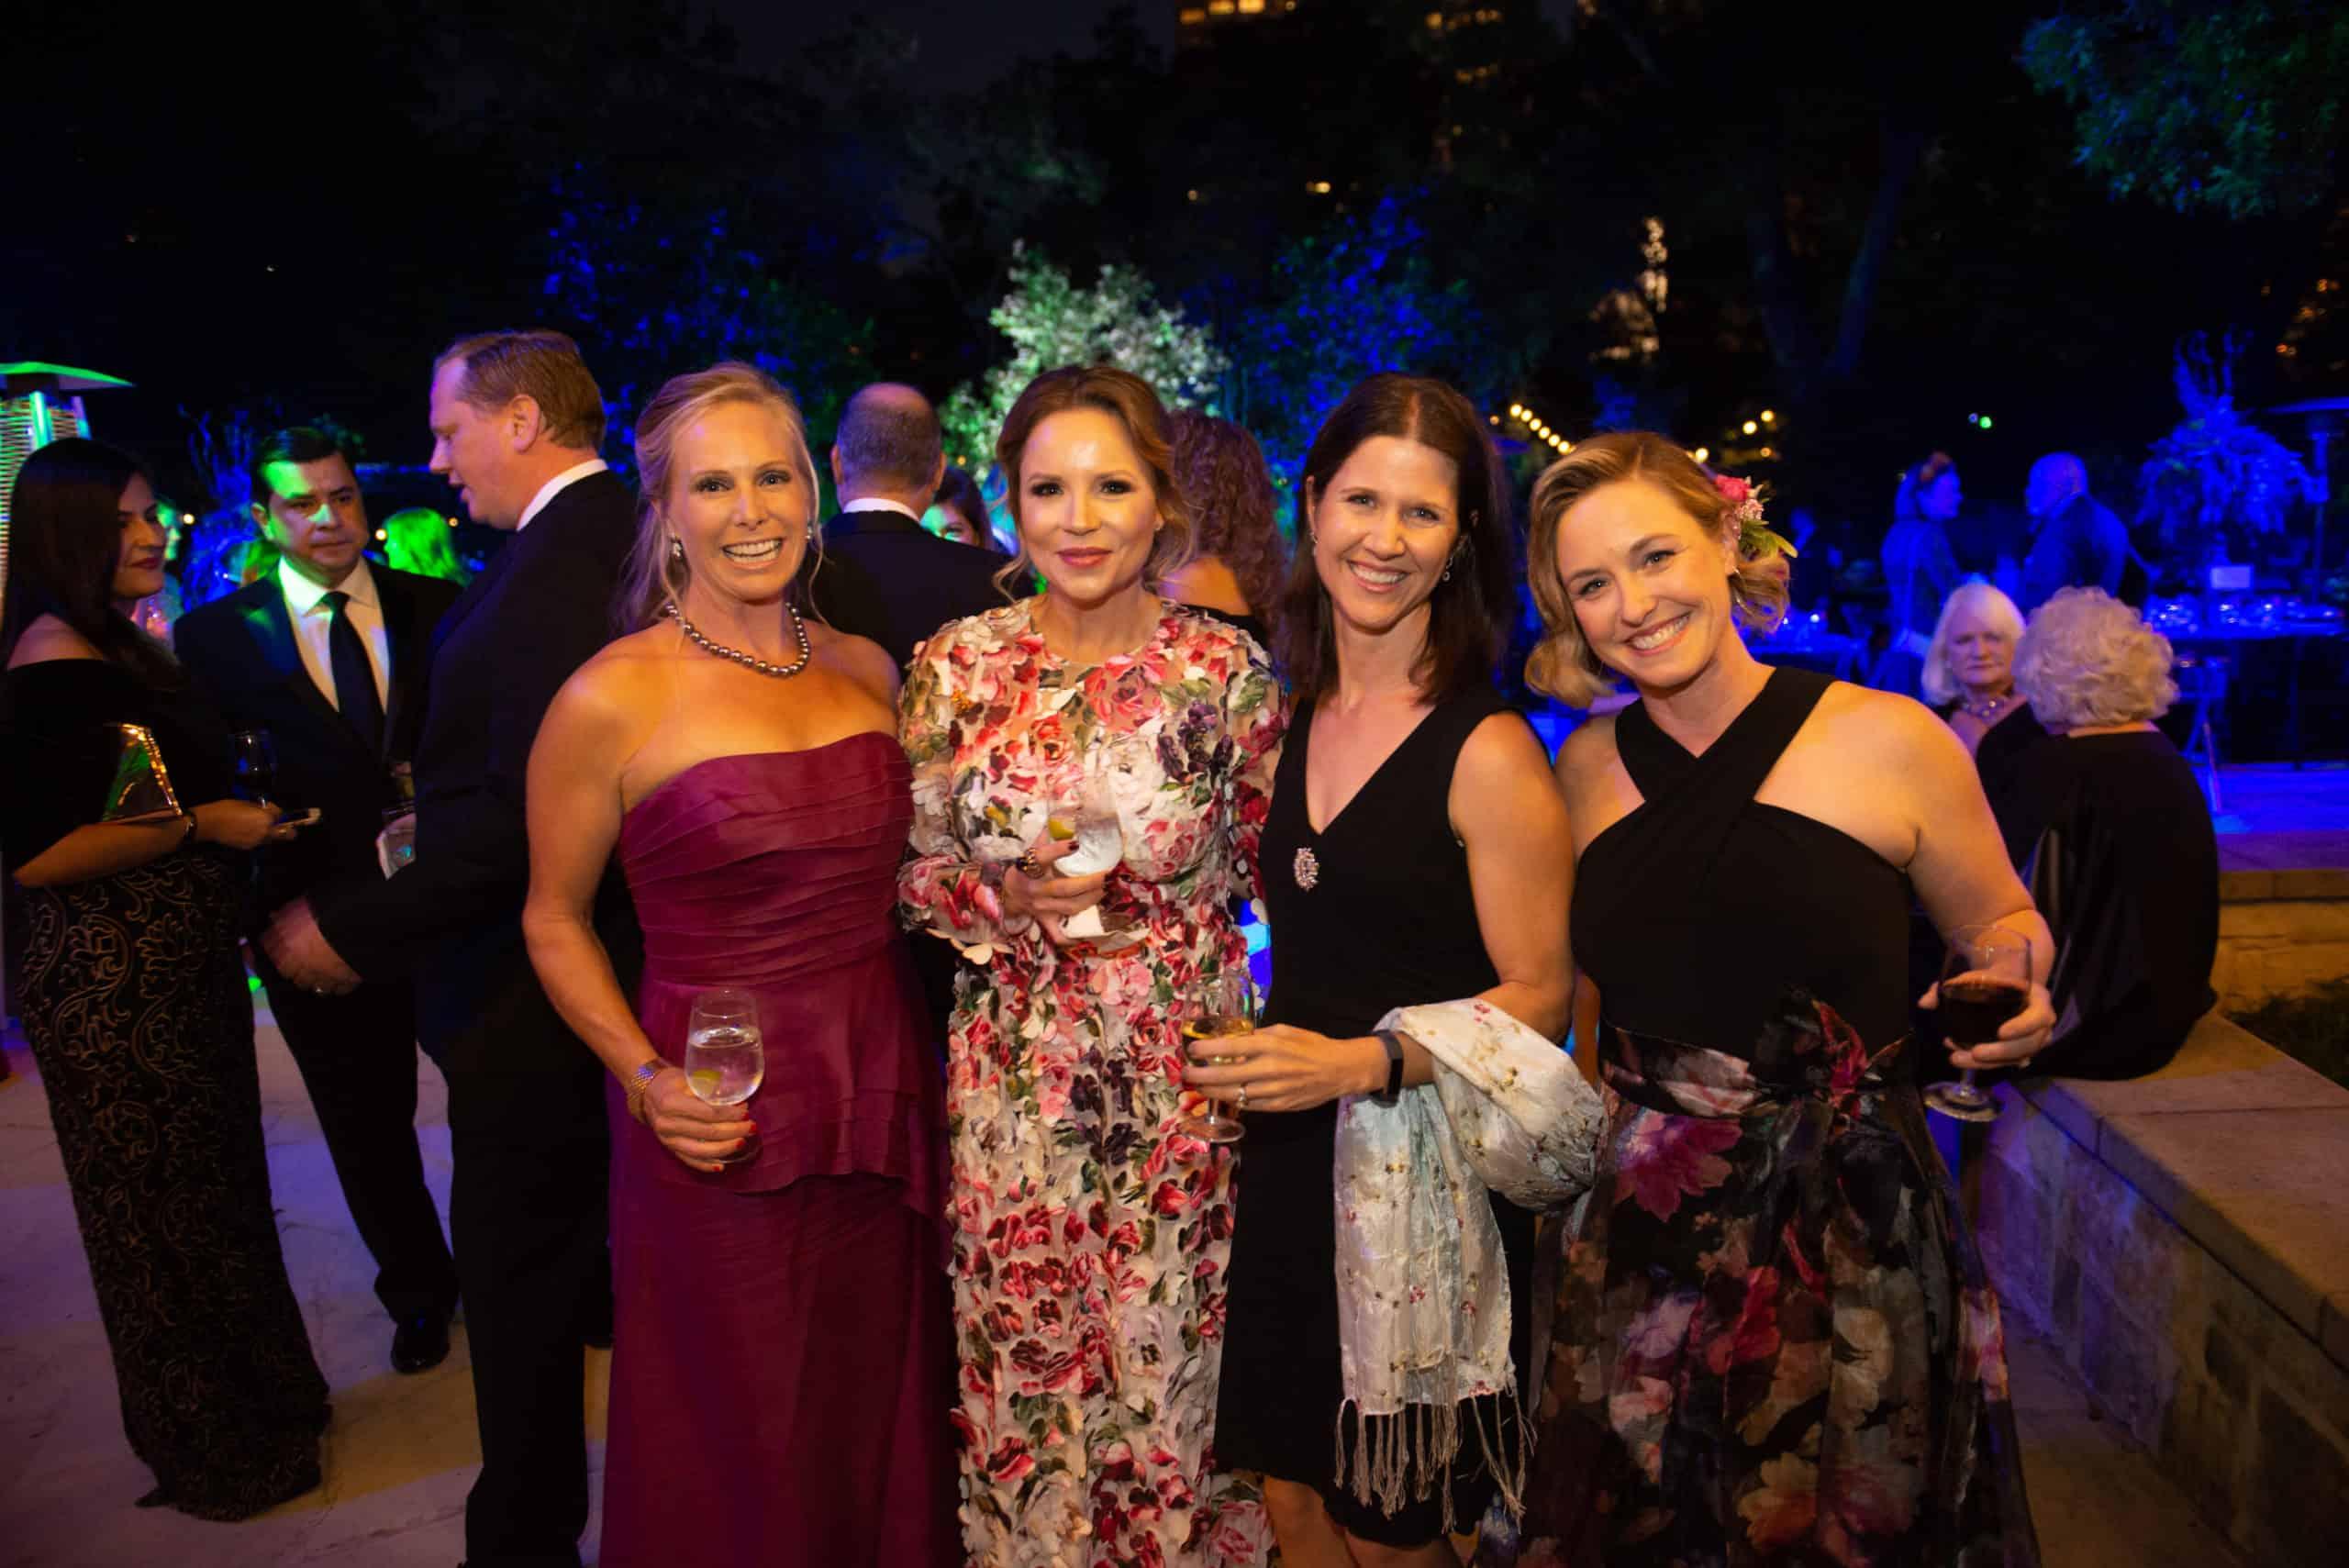 Ann Cross, Ana Leah Montemayor, Michelle Head, and Jessica Mewborne